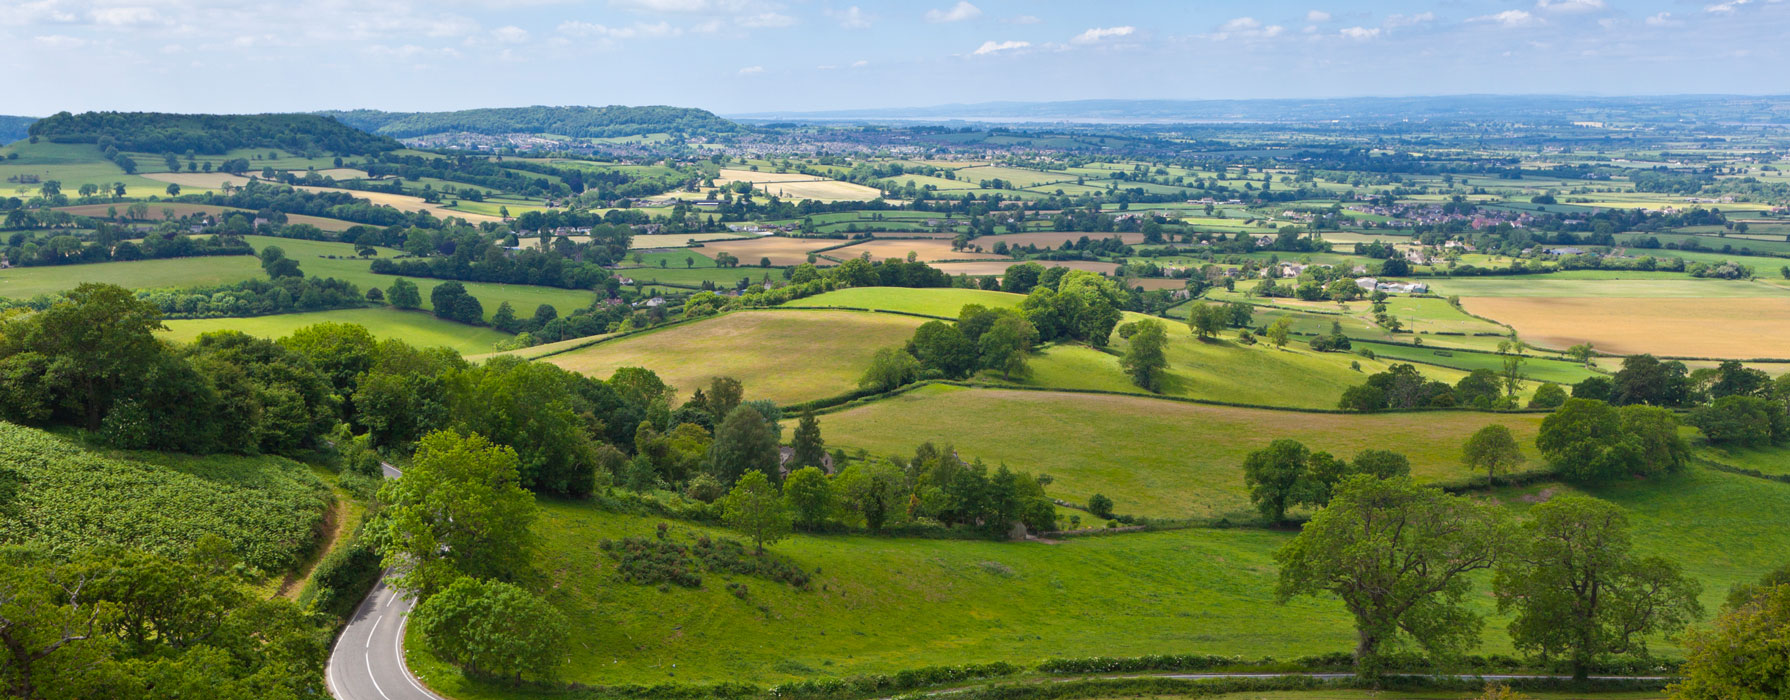 Countryside-Management-BSc-D455-crop